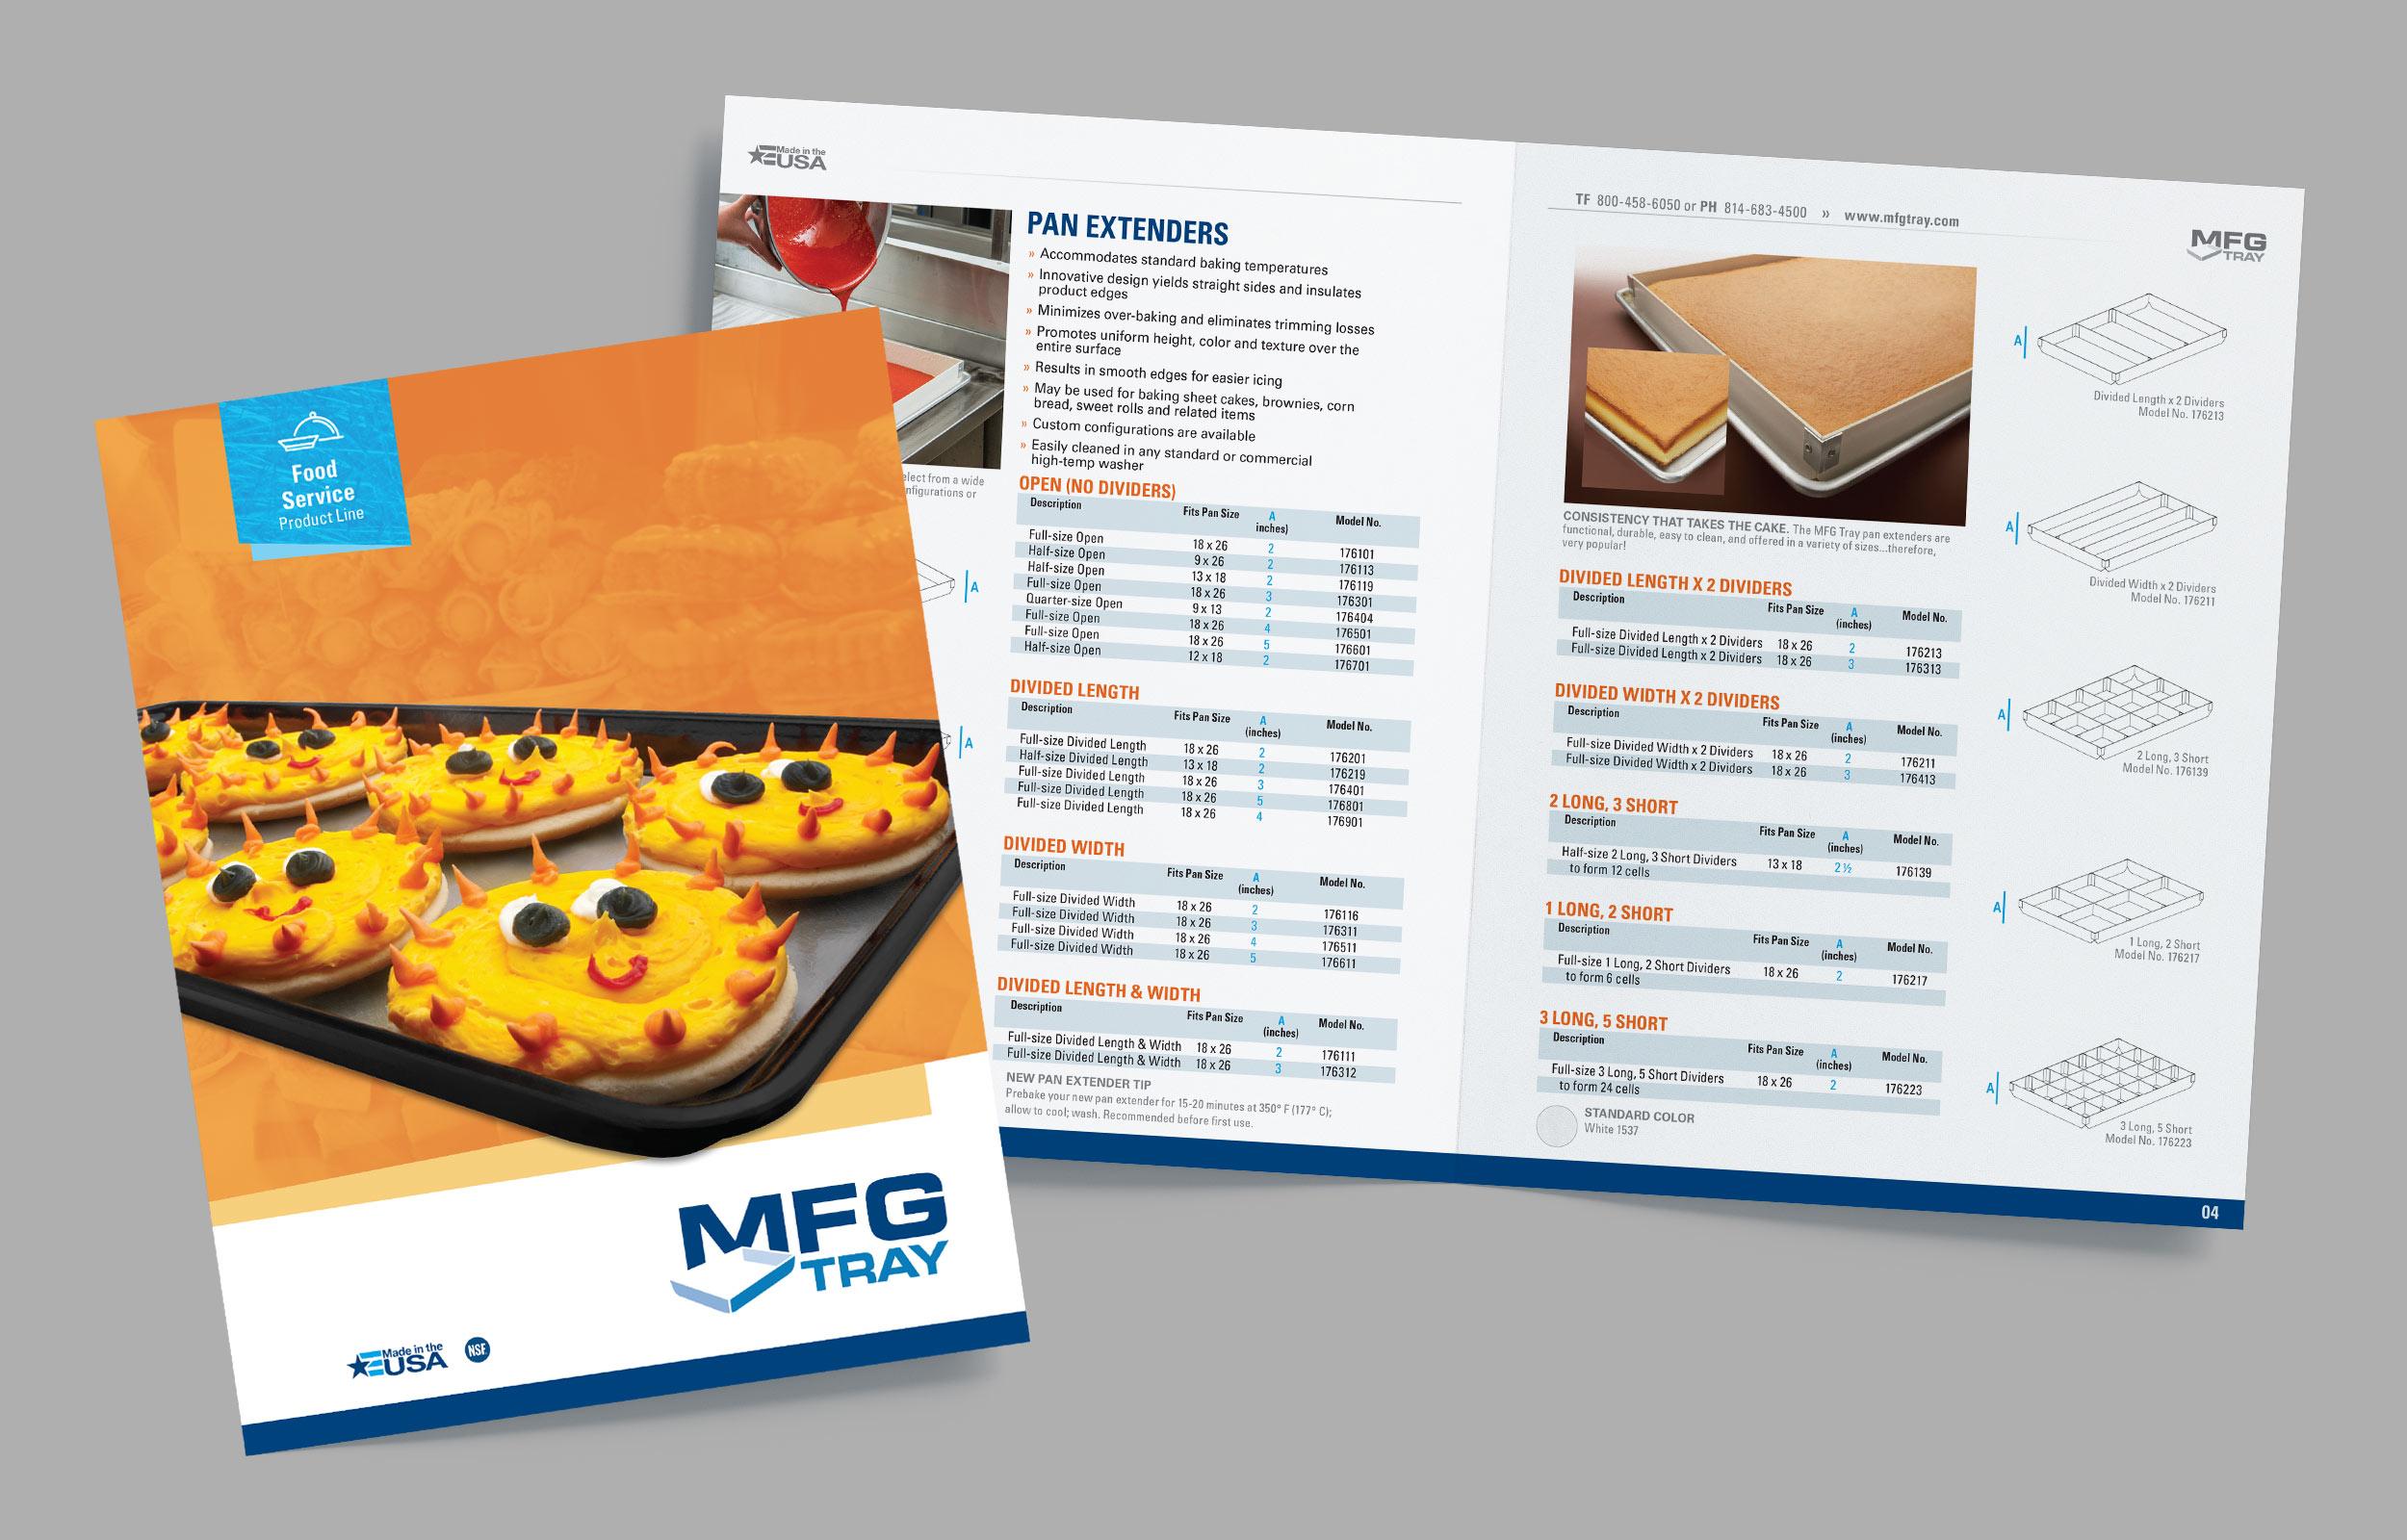 https://papaadvertising.com/wp-content/uploads/2019/08/MFTG-food_service_catalog.jpg